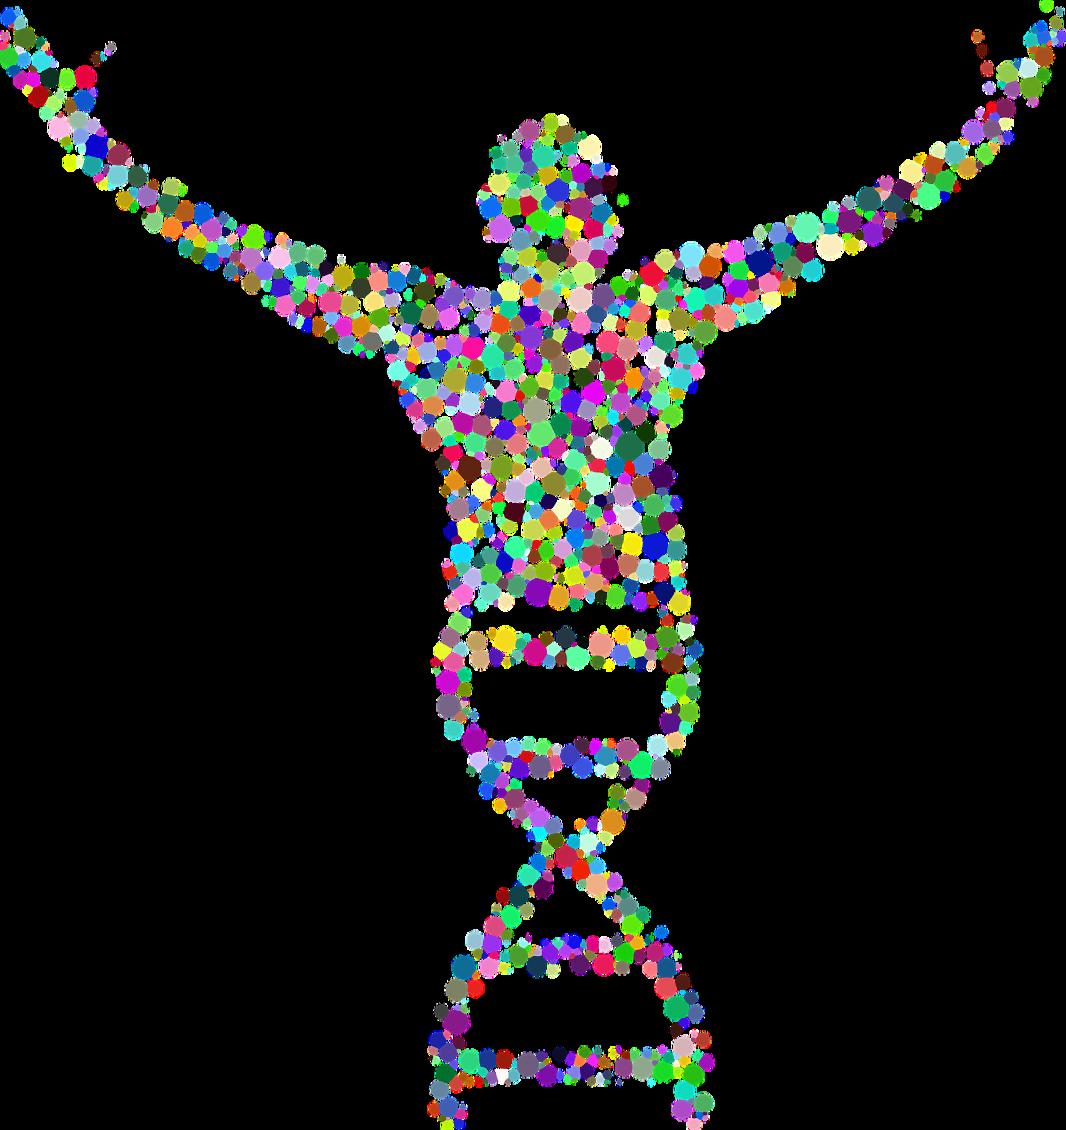 dna-spiral dots man arms gene